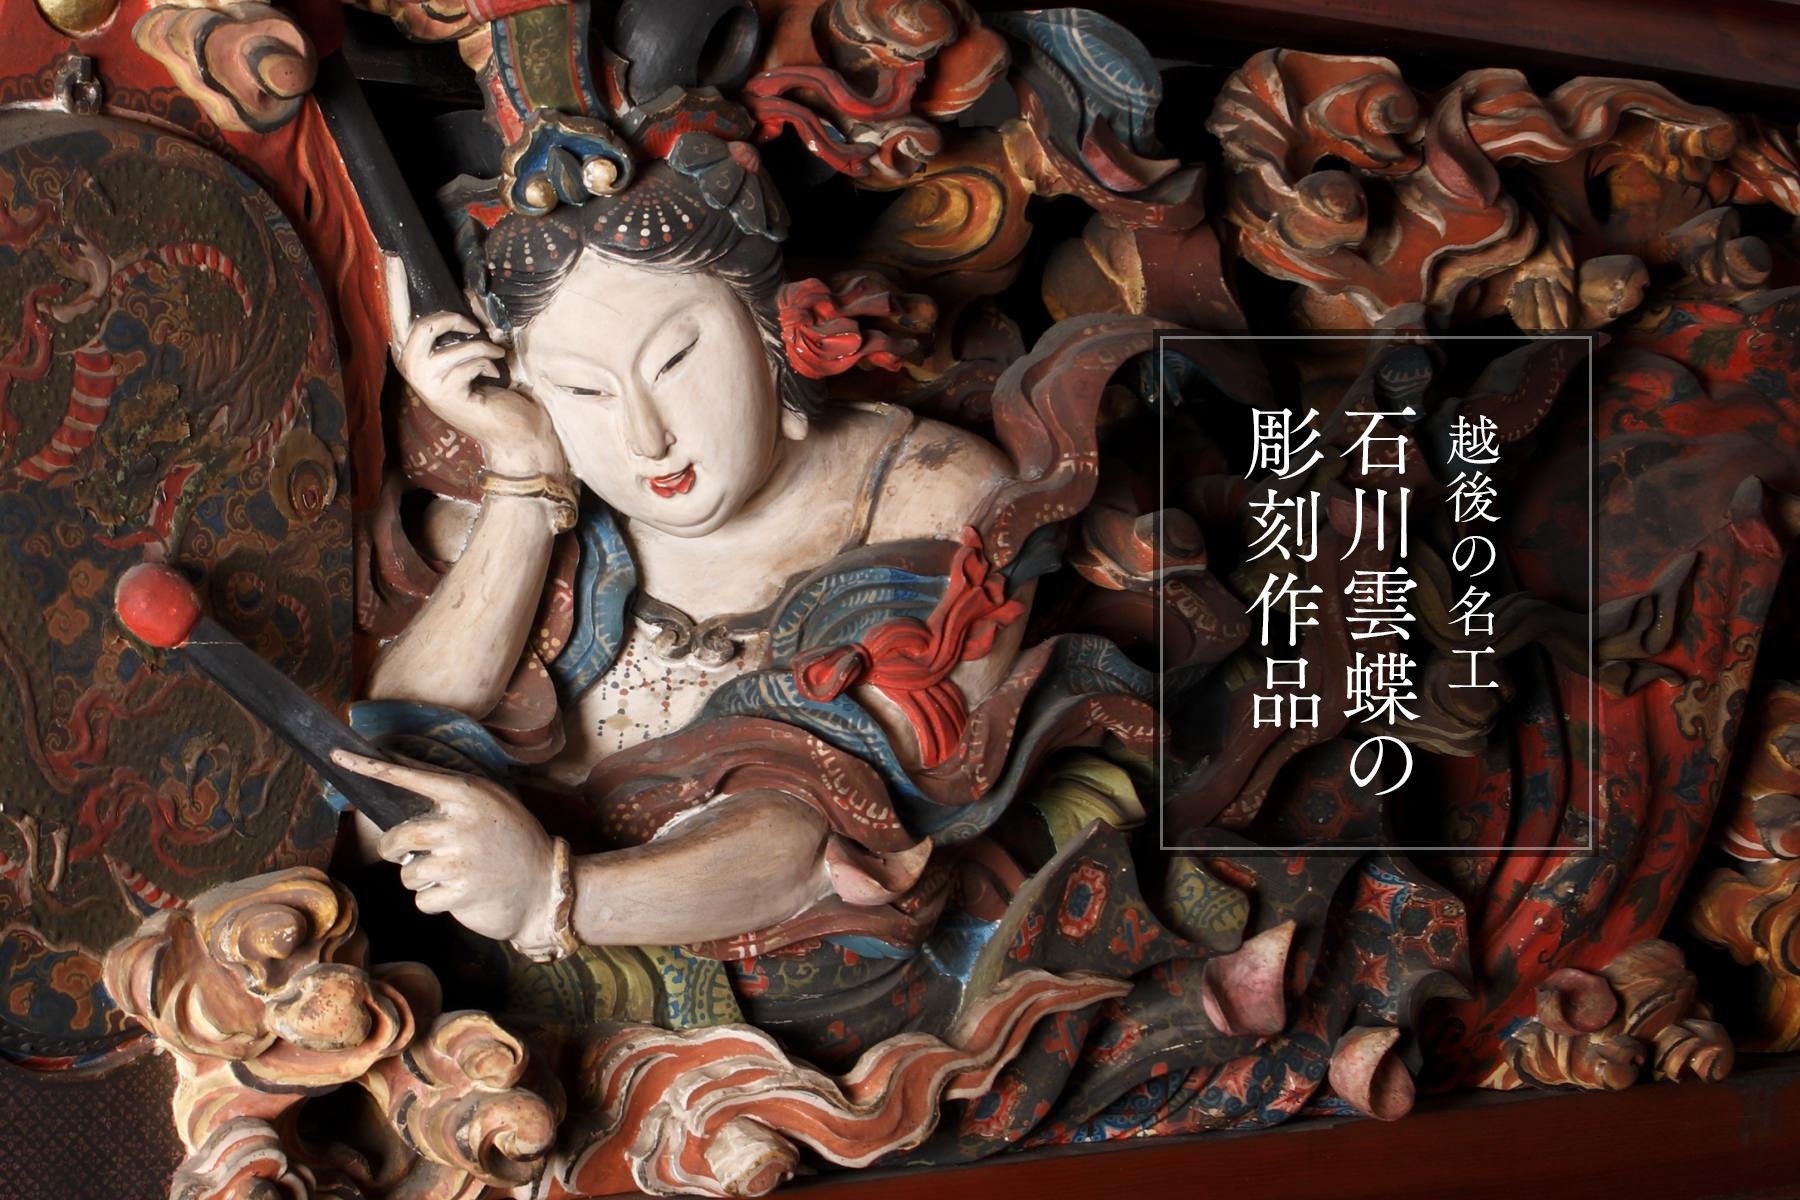 越後の名工・石川雲蝶の彫刻作品